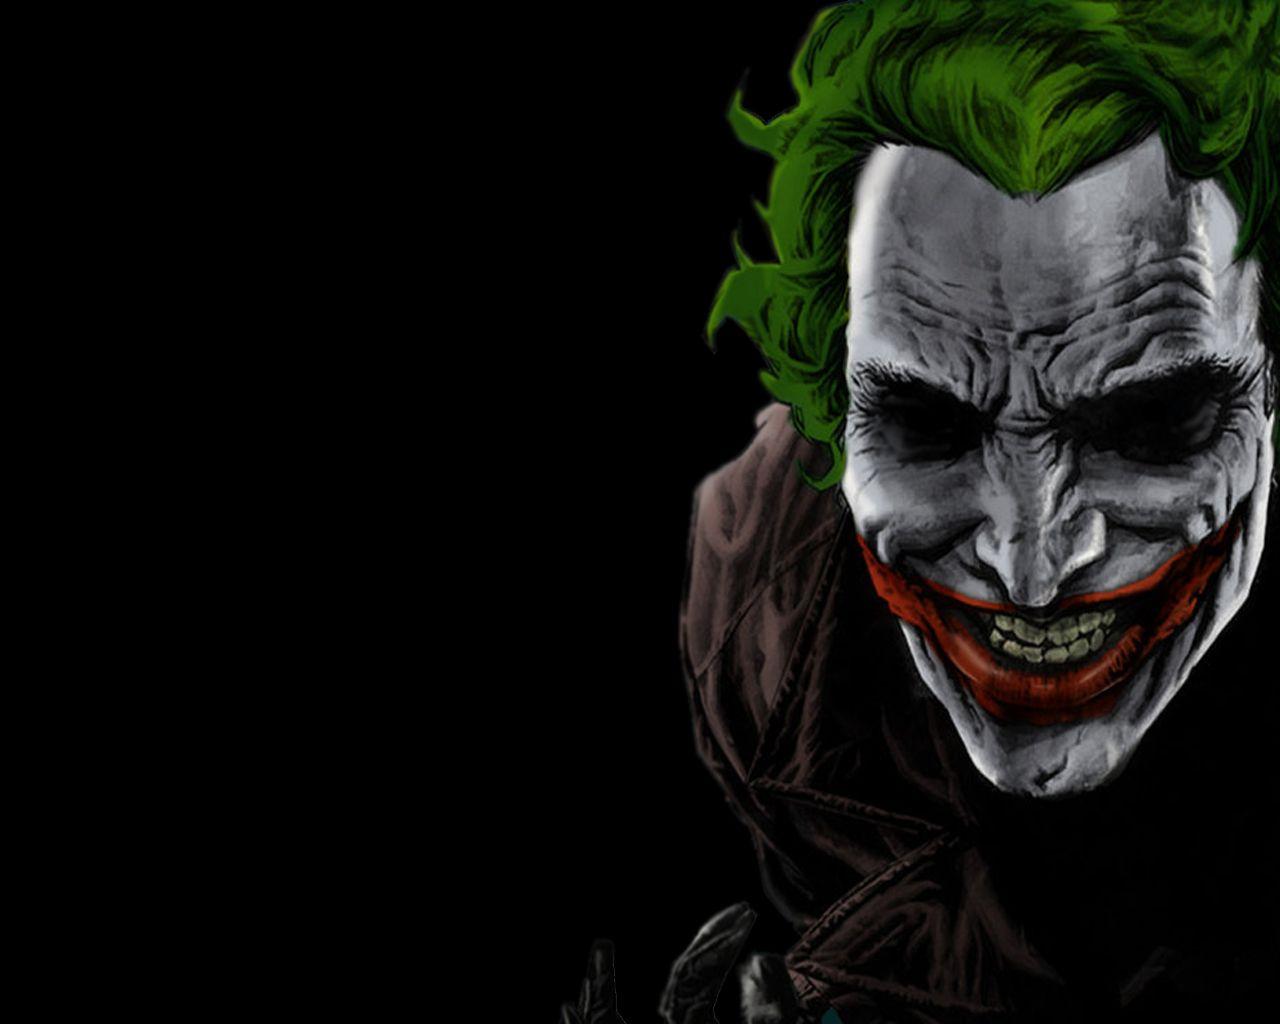 Joker Why So Serious Wallpaper 8470 High Resolution Wallrey Com Joker Poster Joker Print Joker Images